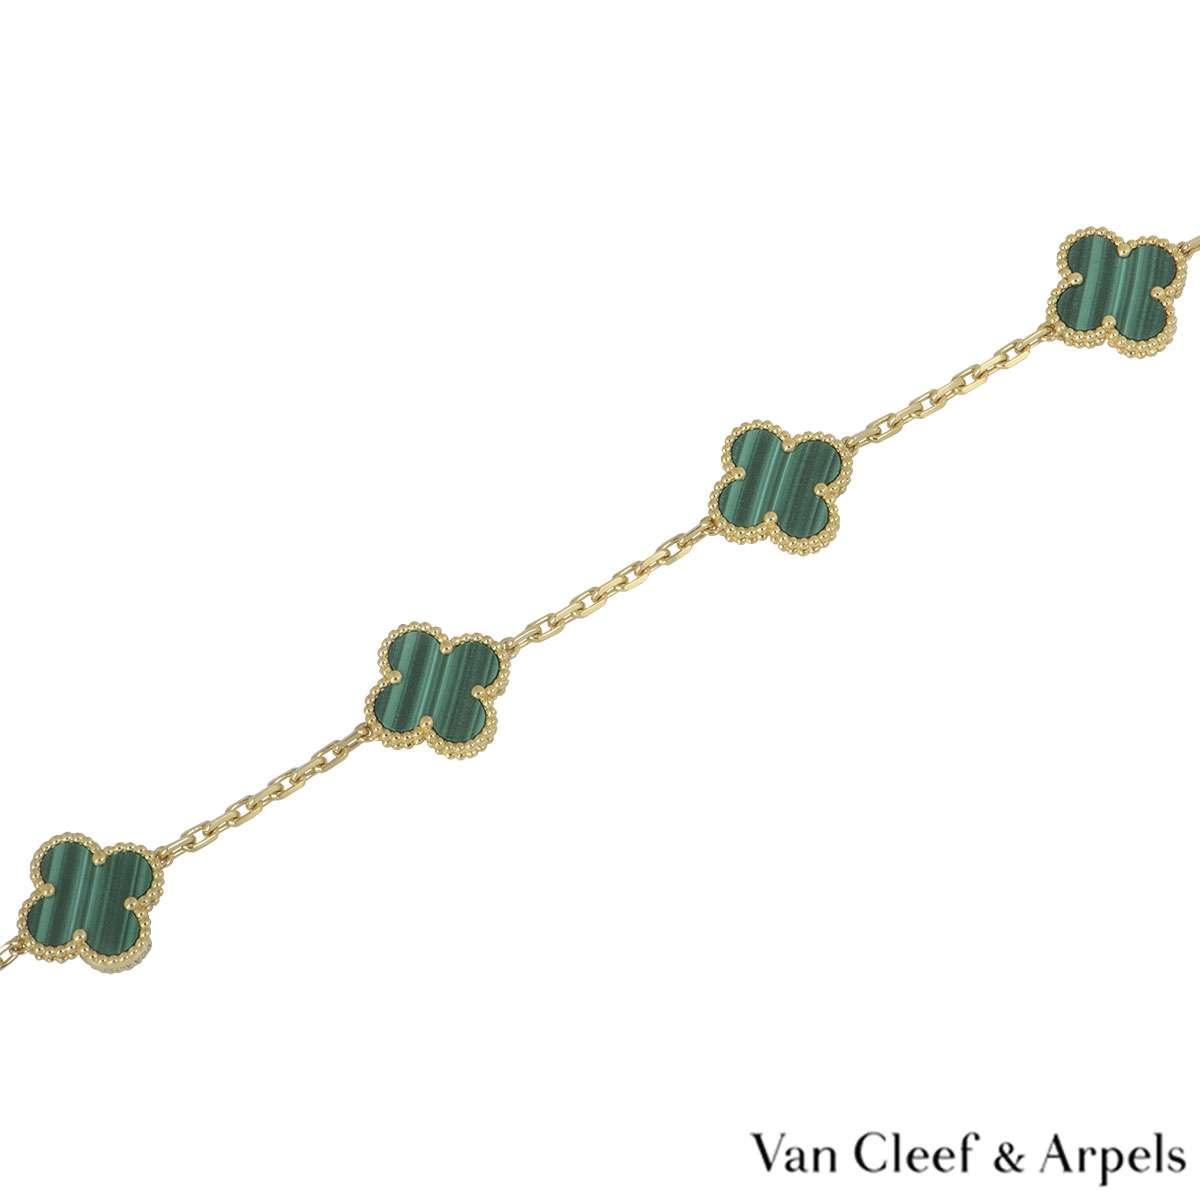 Van Cleef & Arpels Malachite Vintage Alhambra Bracelet VCARL80900